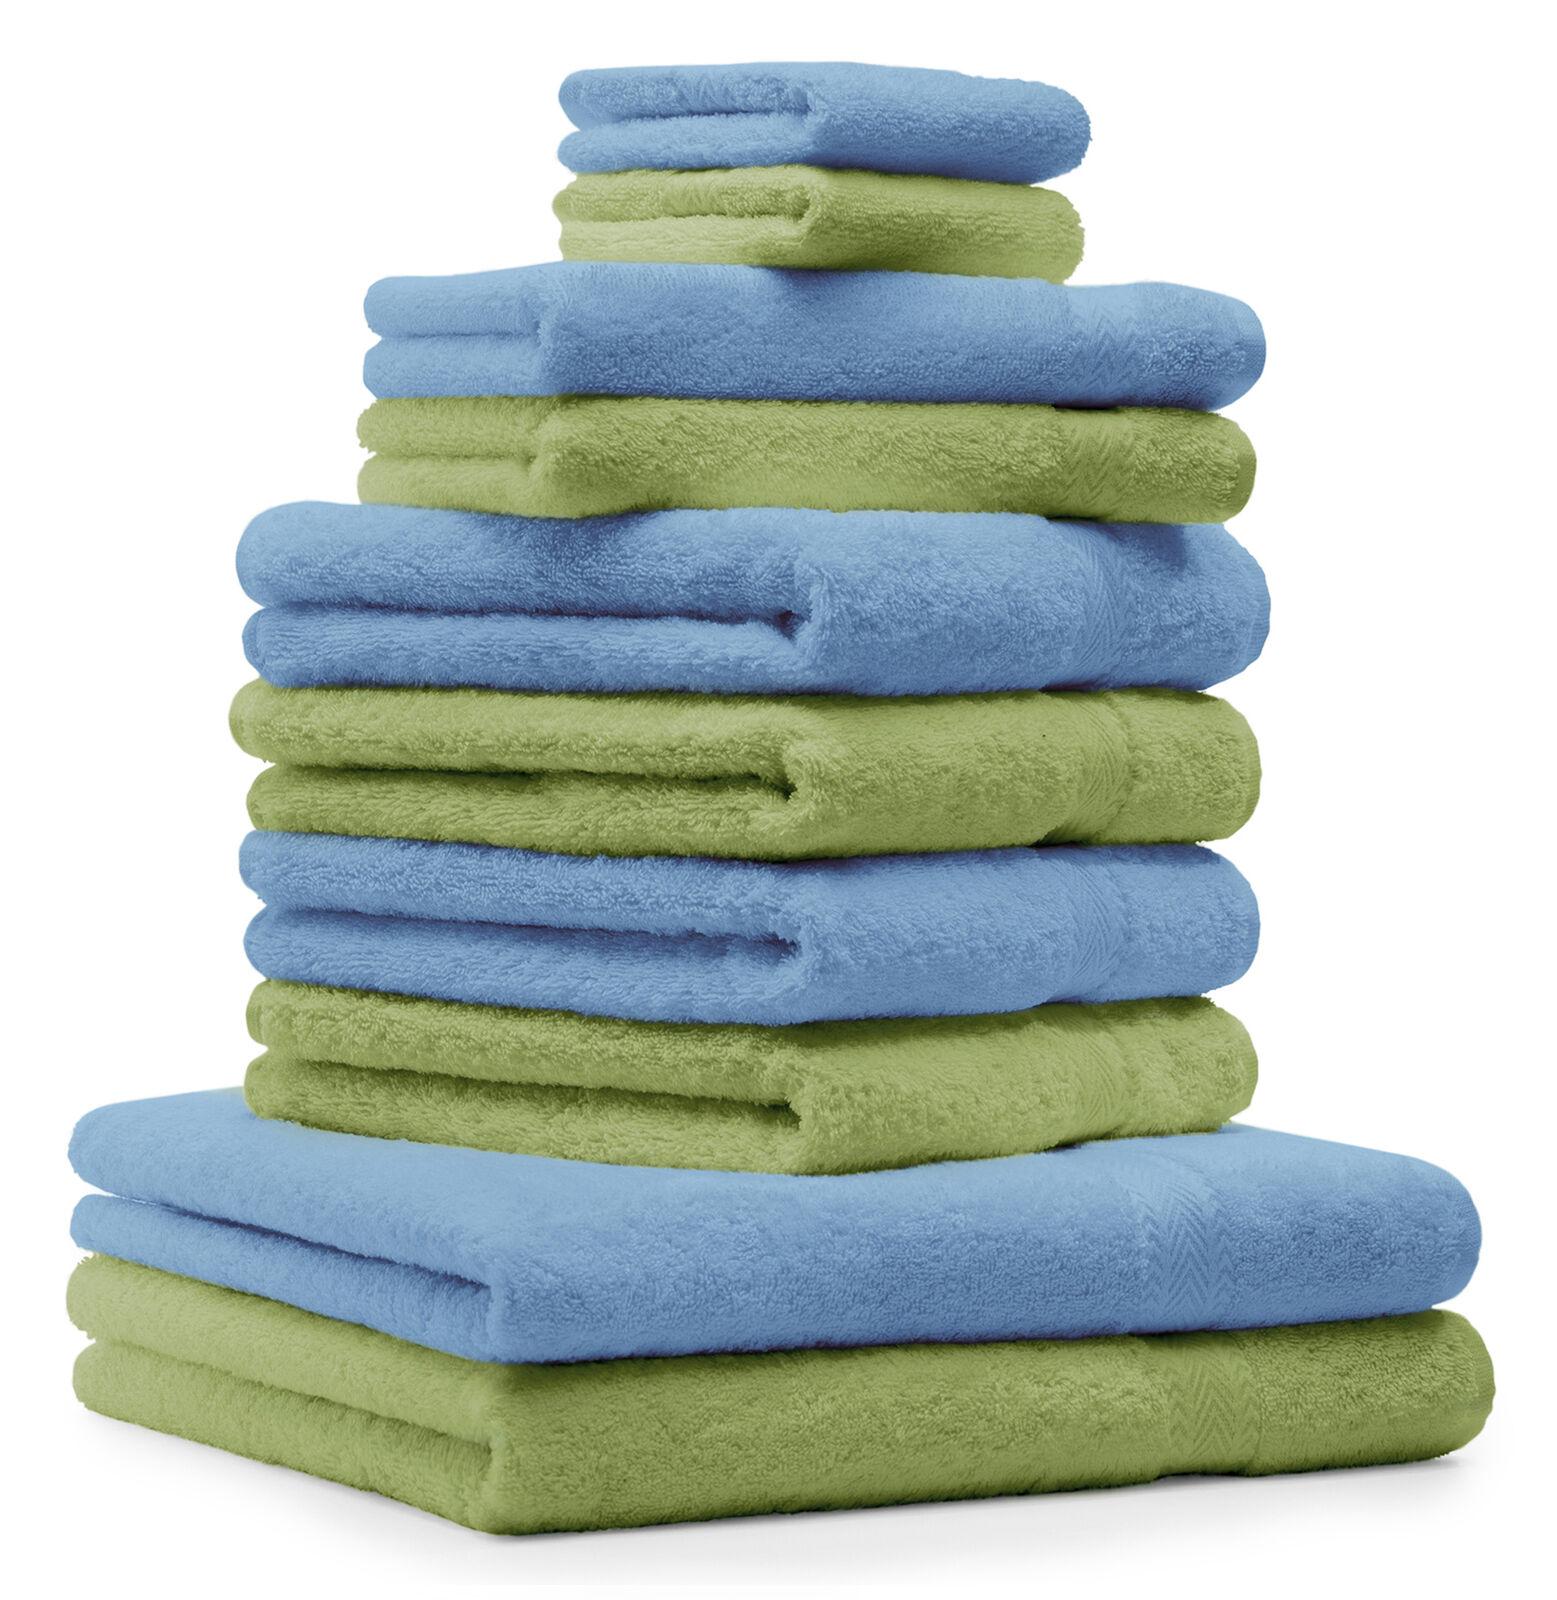 Betz 10-tlg. Handtuch Set Classic Classic Classic Farbe Apfel-Grün & Hellblau     | Viele Sorten  814d16